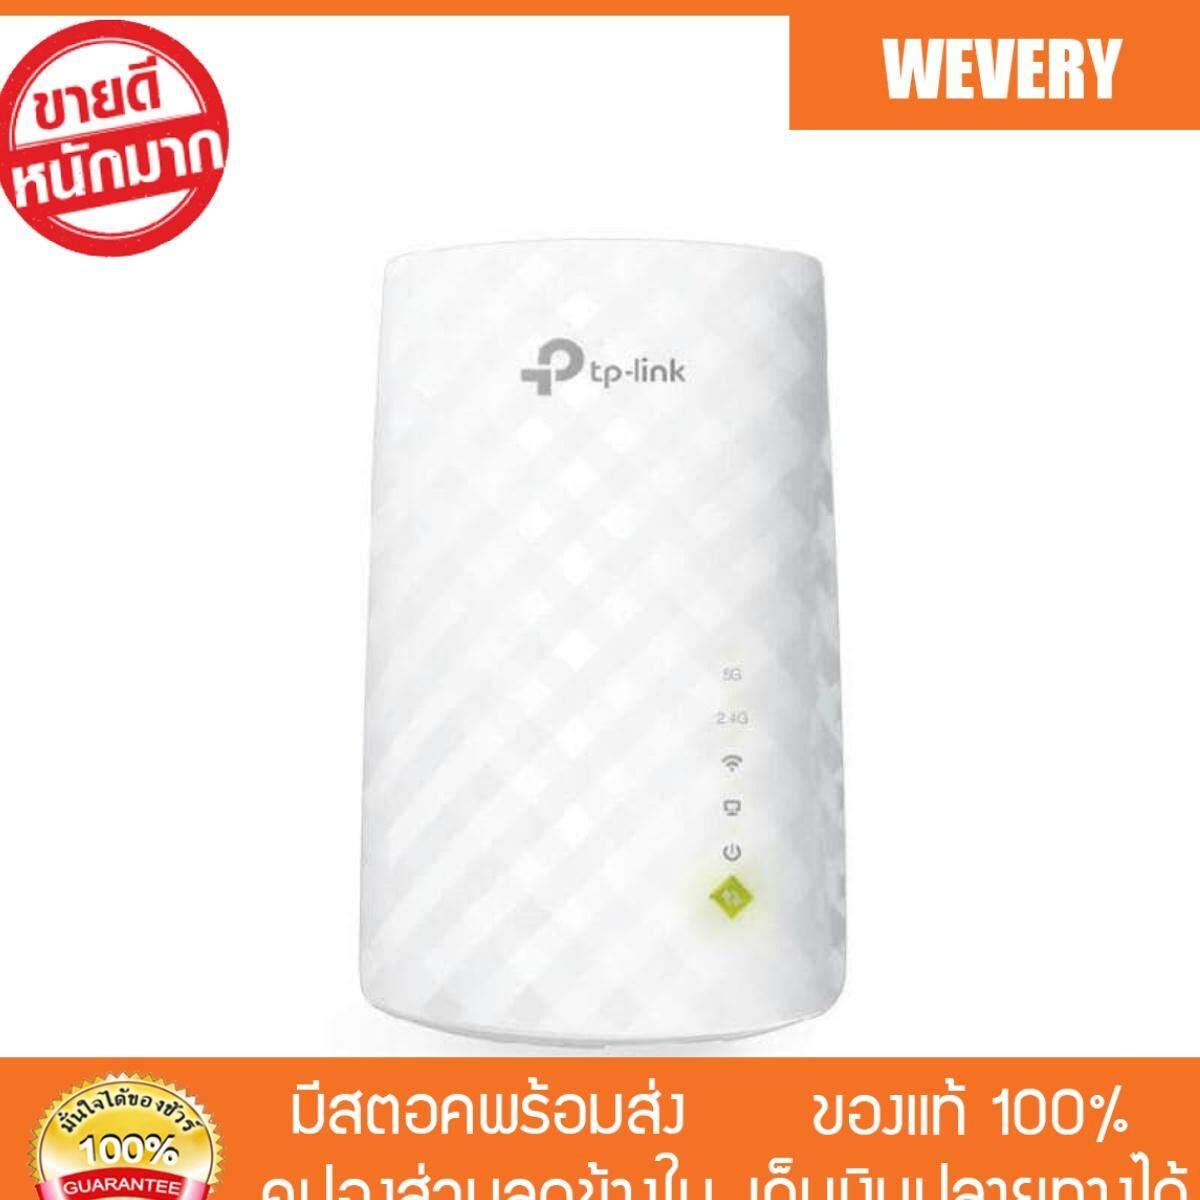 [Wevery] TP-LINK RE200 อุปกรณ์ขยายสัญญาณ Wi-Fi Repeater (AC750 Wi-Fi Range Extender) ขยายไวไฟ ส่ง Kerry เก็บปลายทางได้